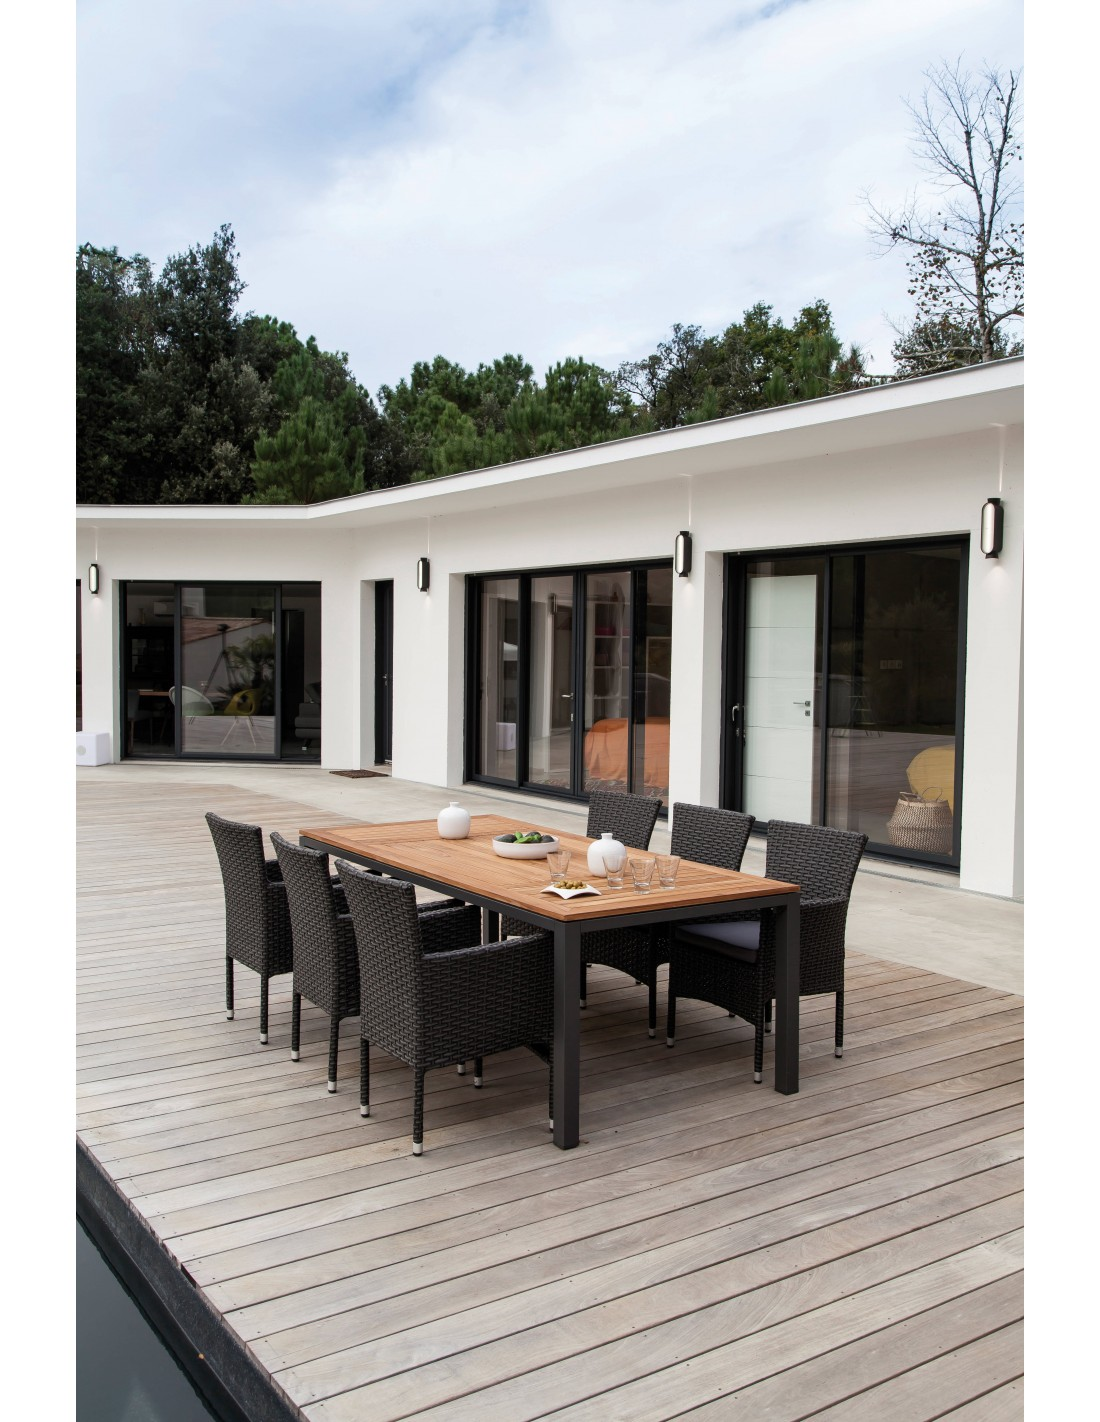 Table de jardin 210x100cm en aluminium et teck FSC- Proloisirs